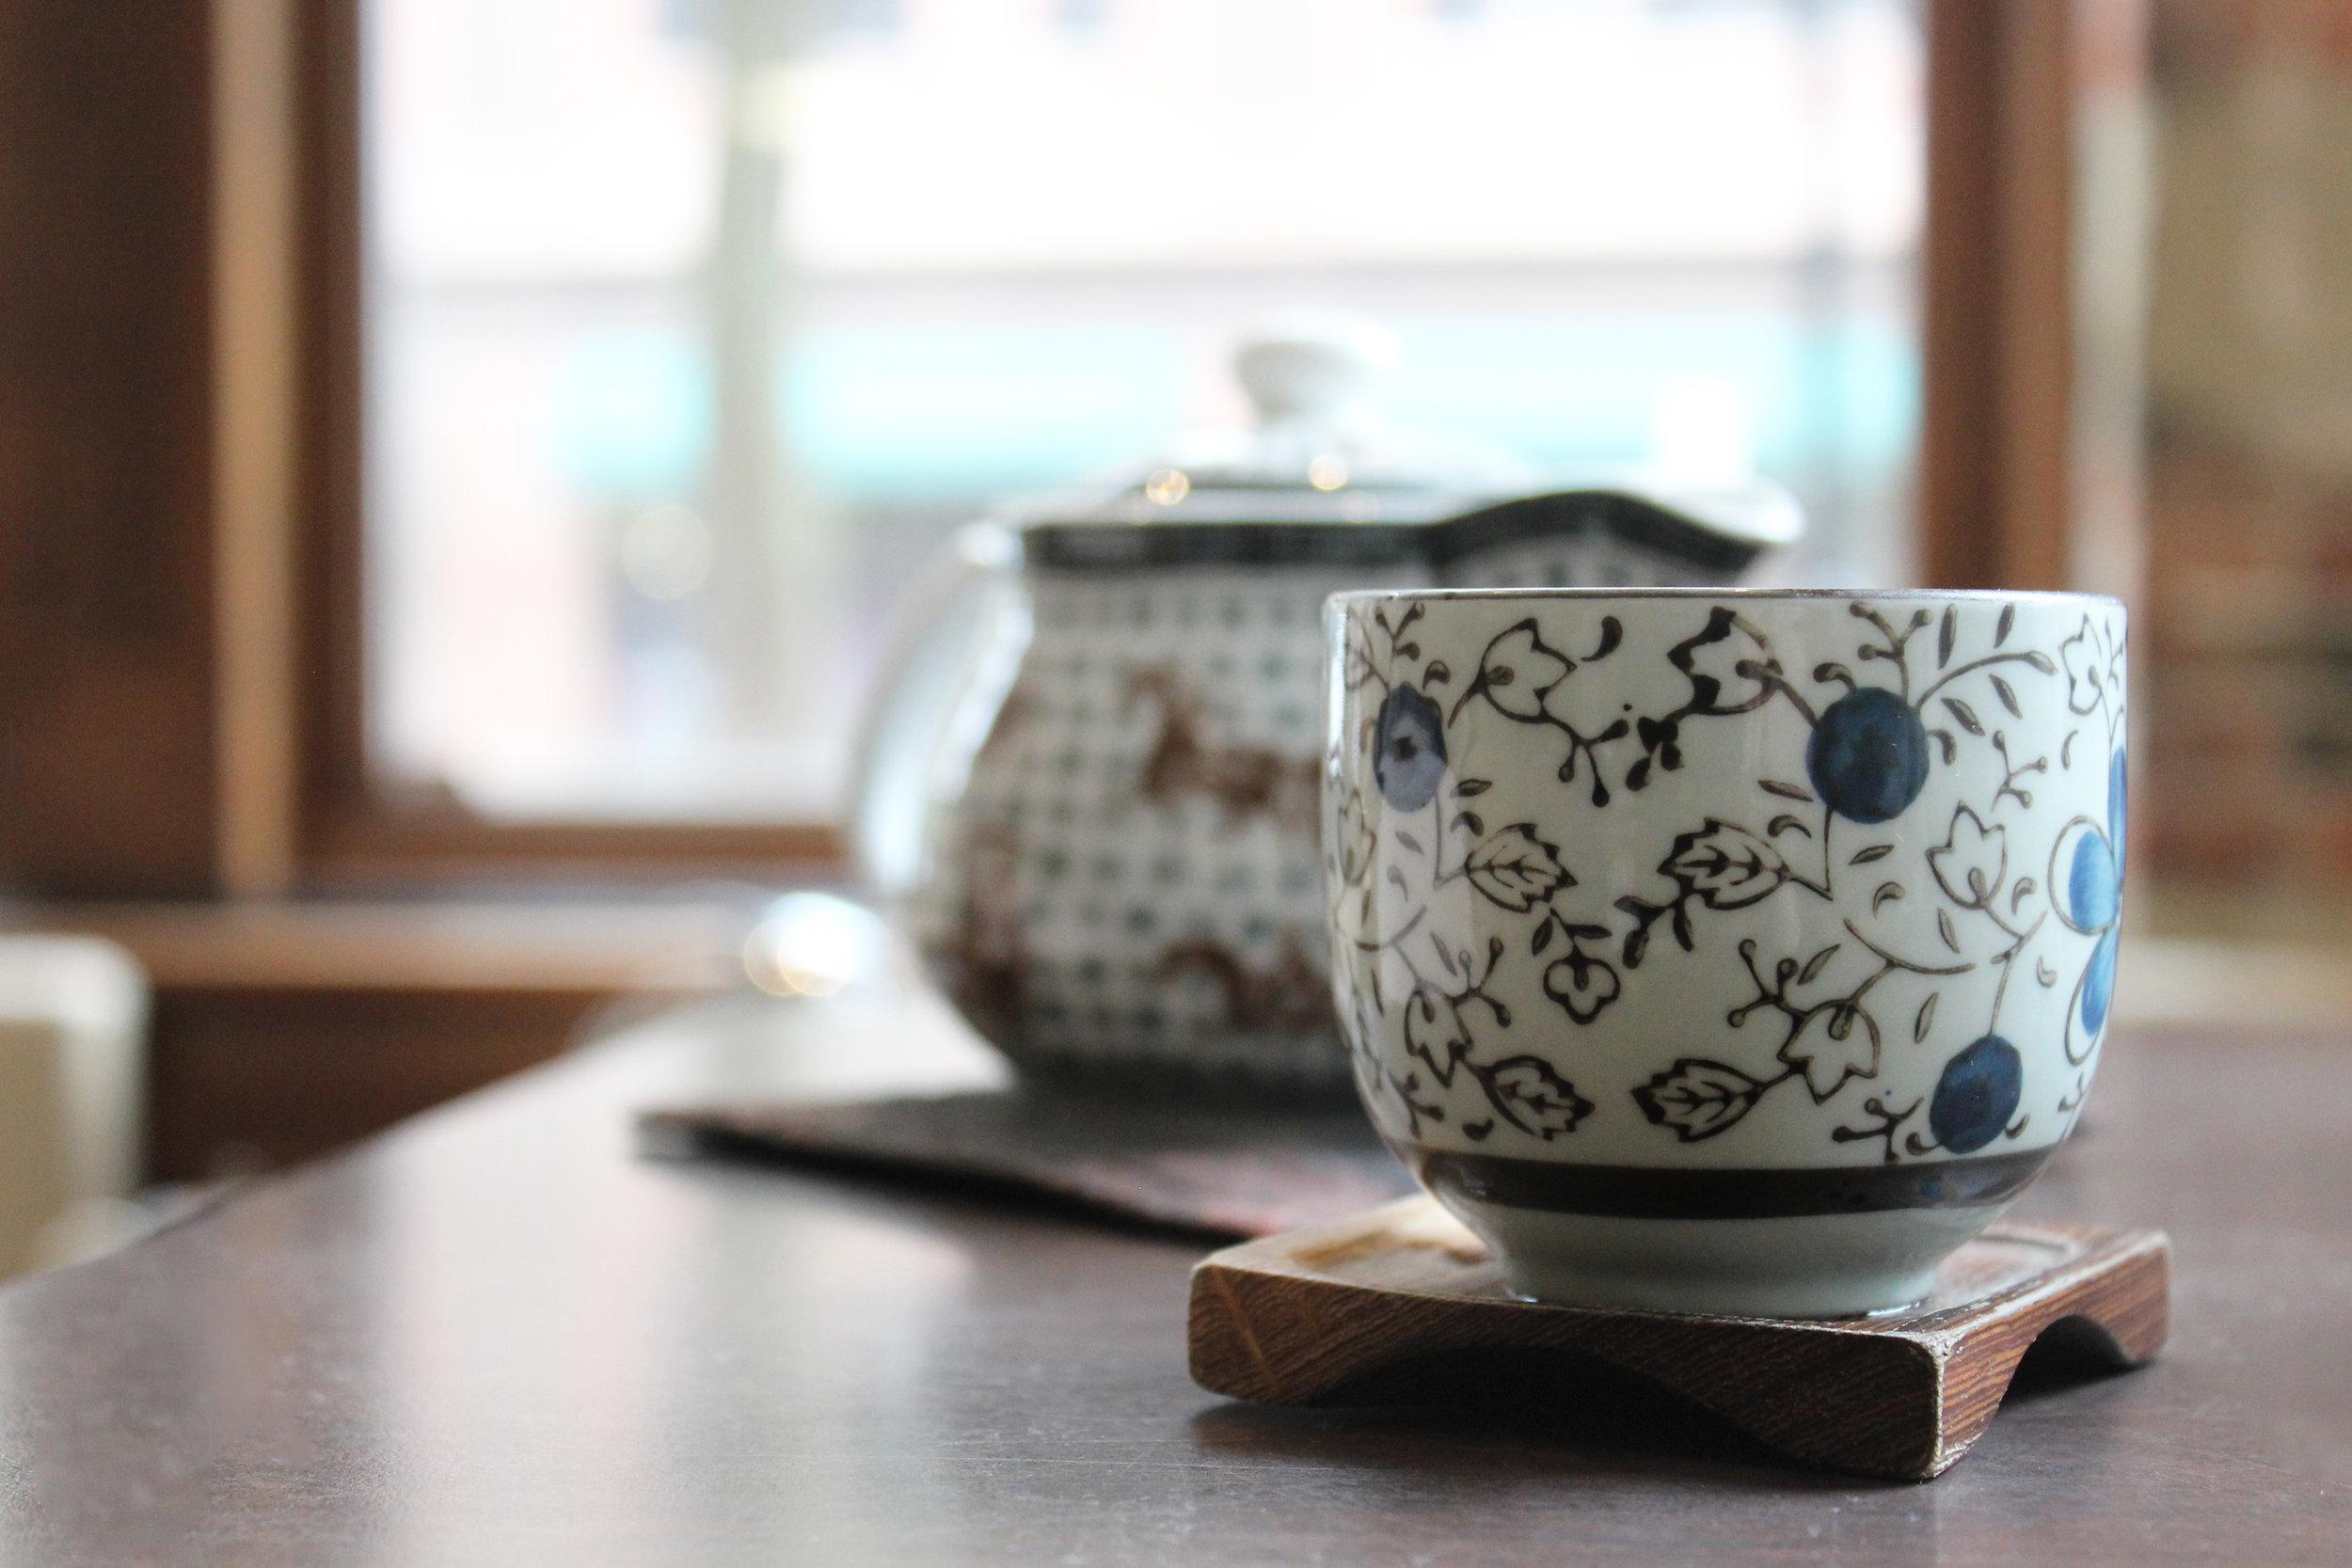 chinese_tea_or_header_new-1024x743.jpg